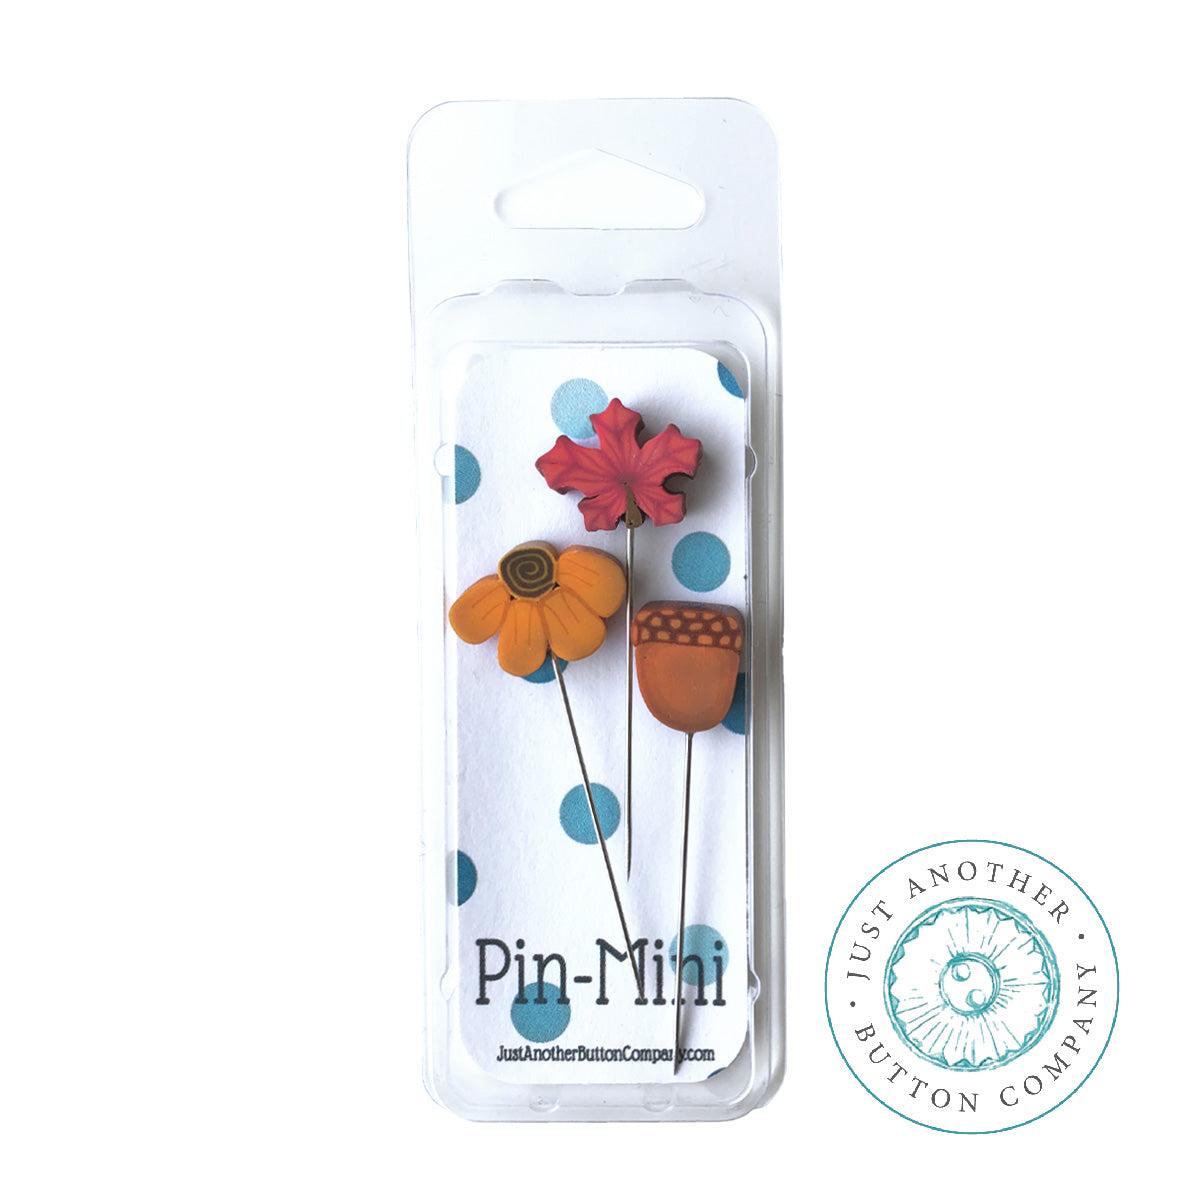 JABC Pin-Mini: Autumn Farmhouse